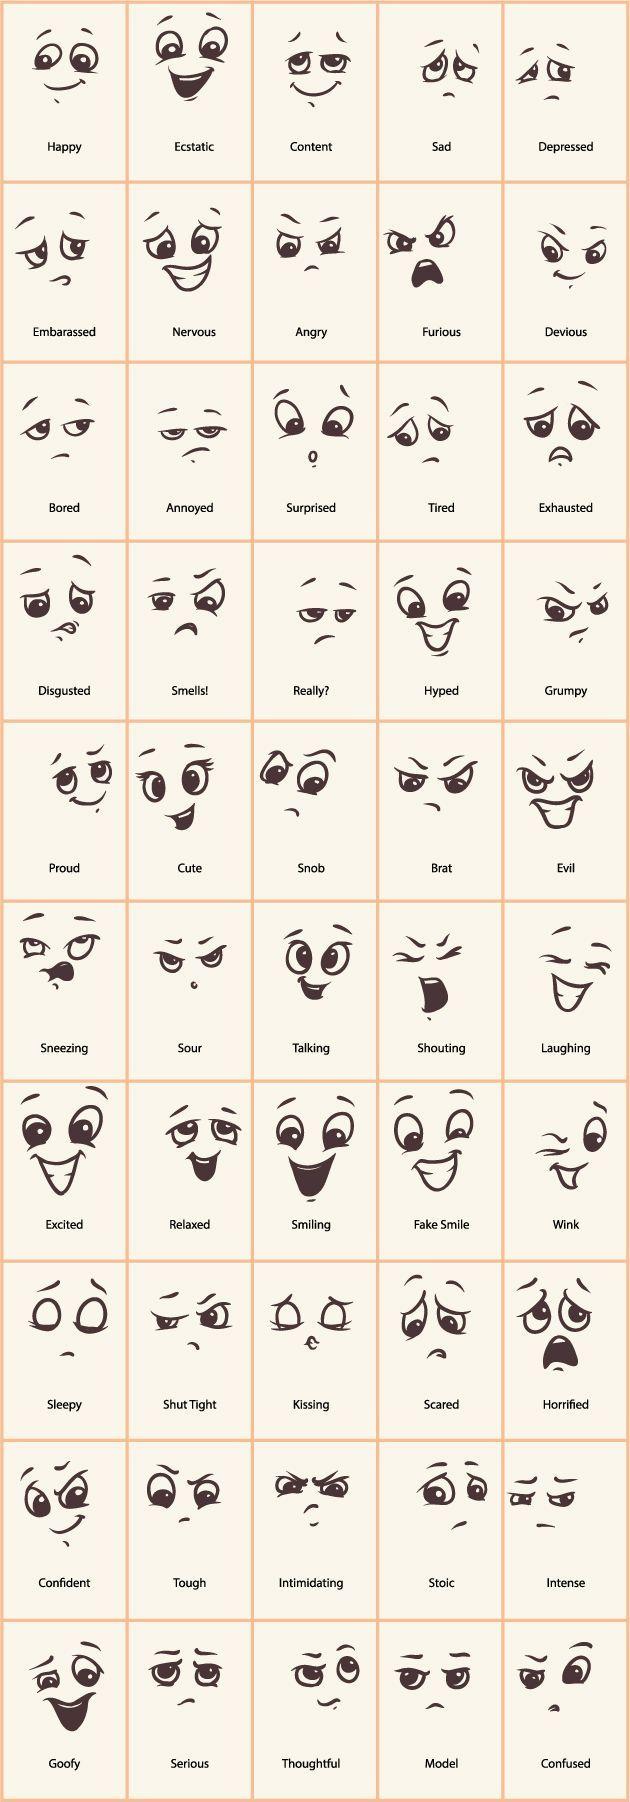 Hand drawn funny expressions vector icons - https://gooloc.com/hand-drawn-funny-expressions-vector-icons/?utm_source=PN&utm_medium=gooloc77%40gmail.com&utm_campaign=SNAP%2Bfrom%2BGooLoc